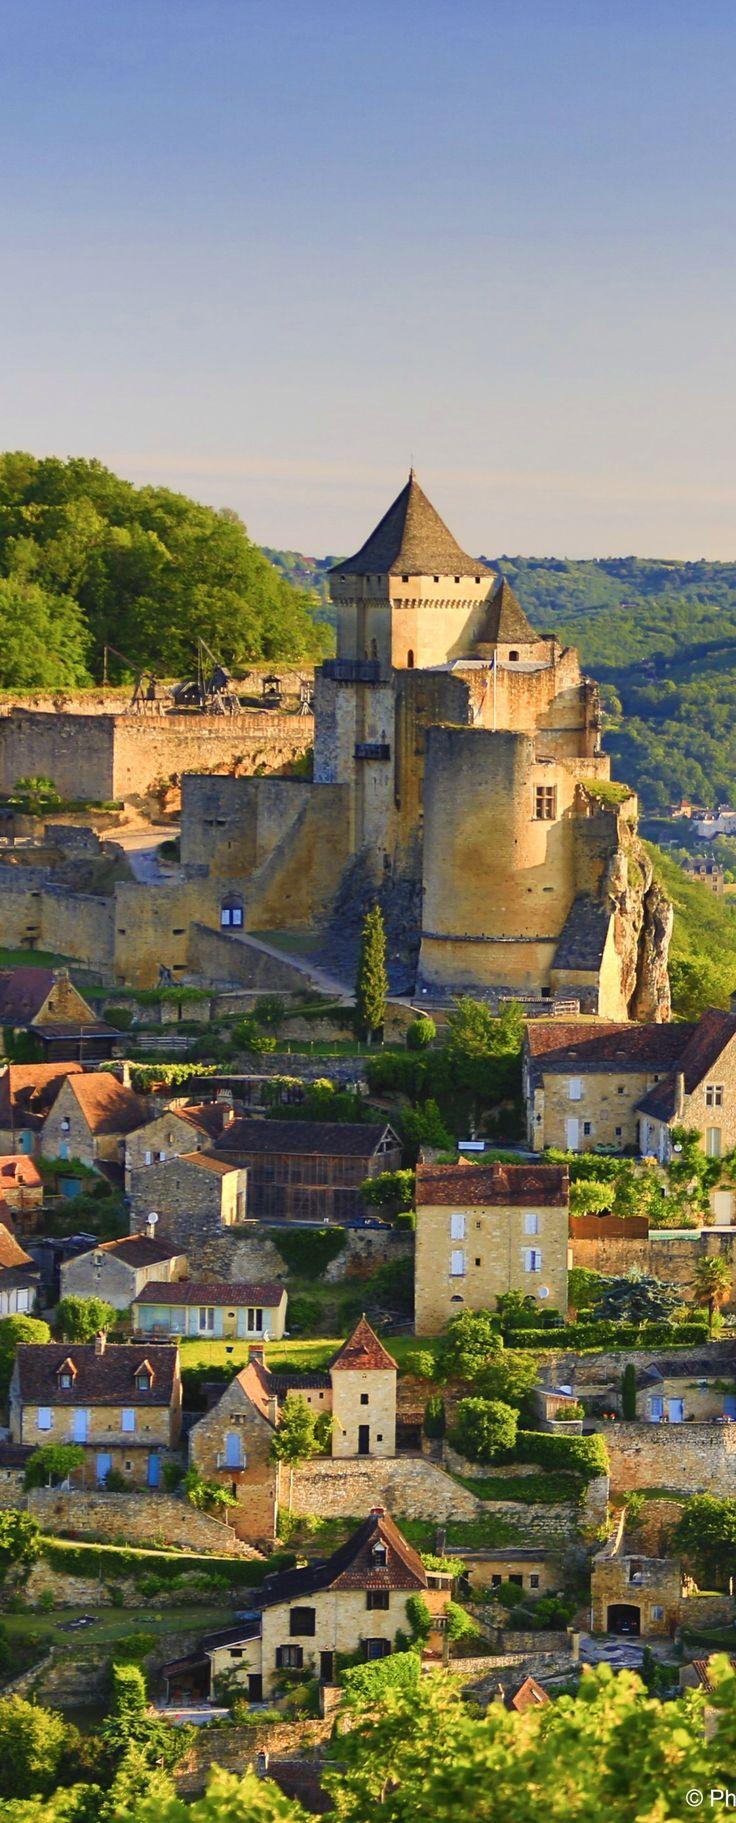 Travel Inspiration for France - Castelnaud-la-Chapelle, en Dordogne, France